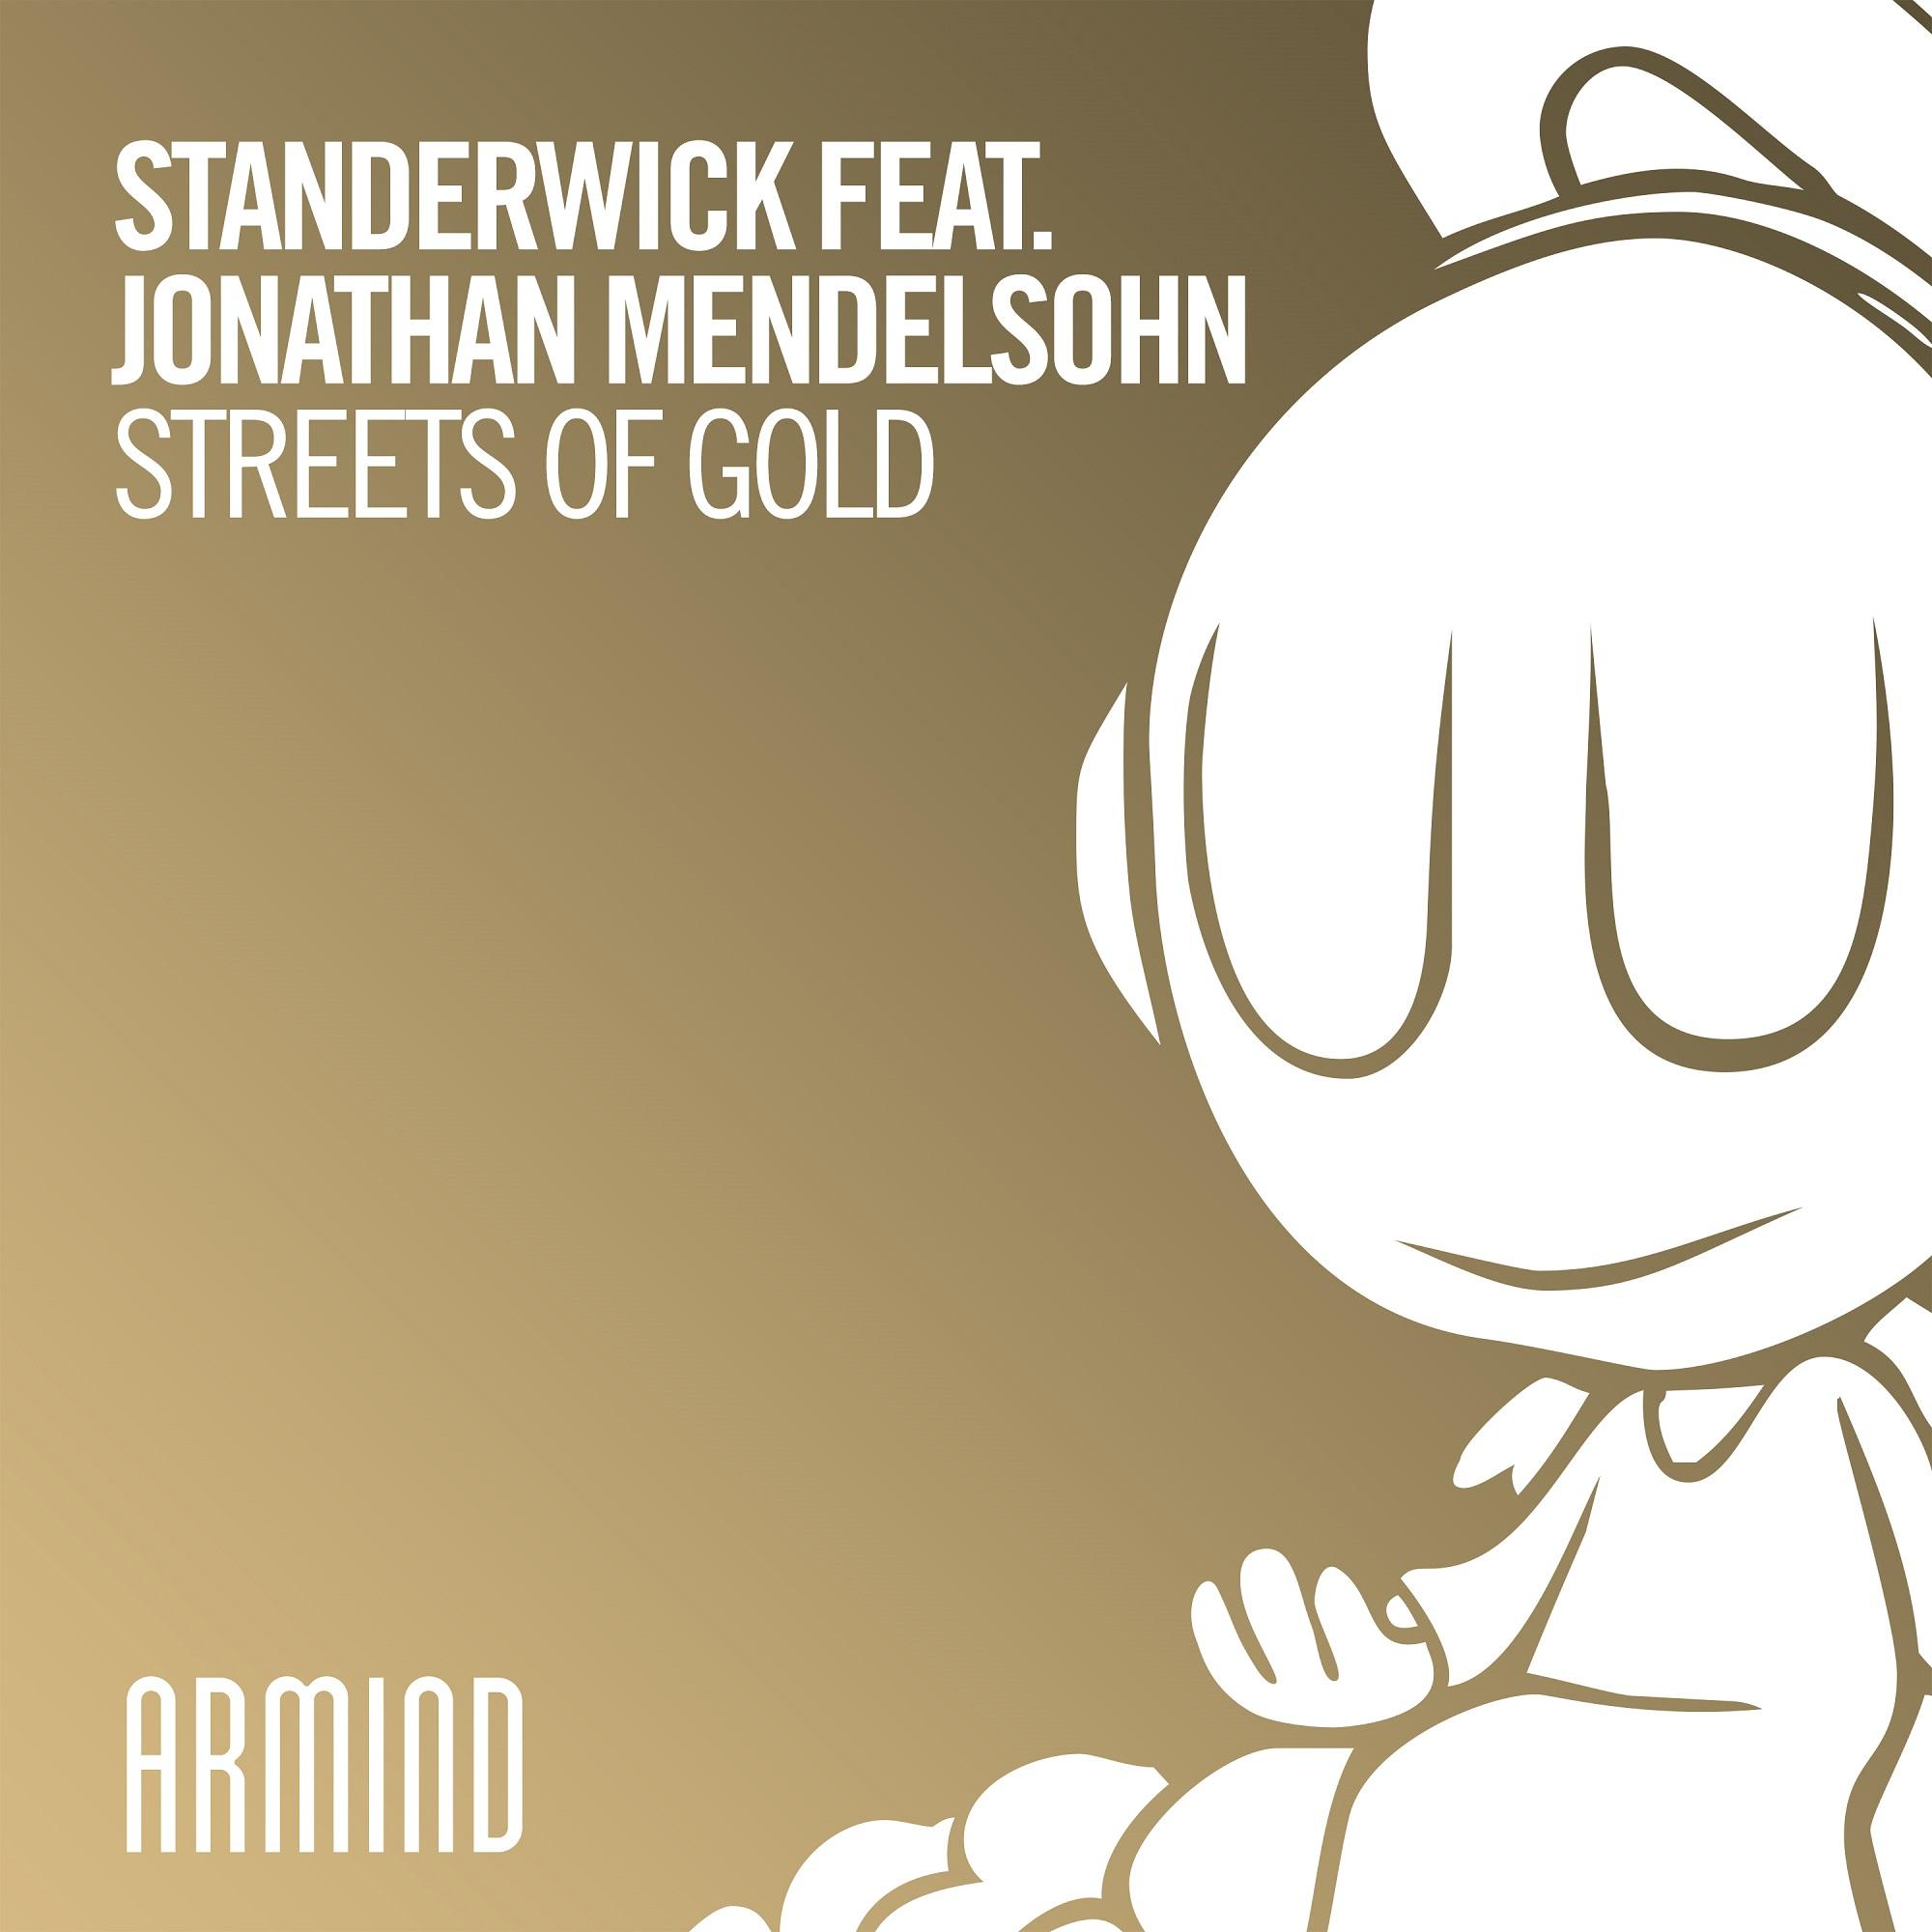 Standerwick feat. Jonathan Mendelsohn - Streets Of Gold